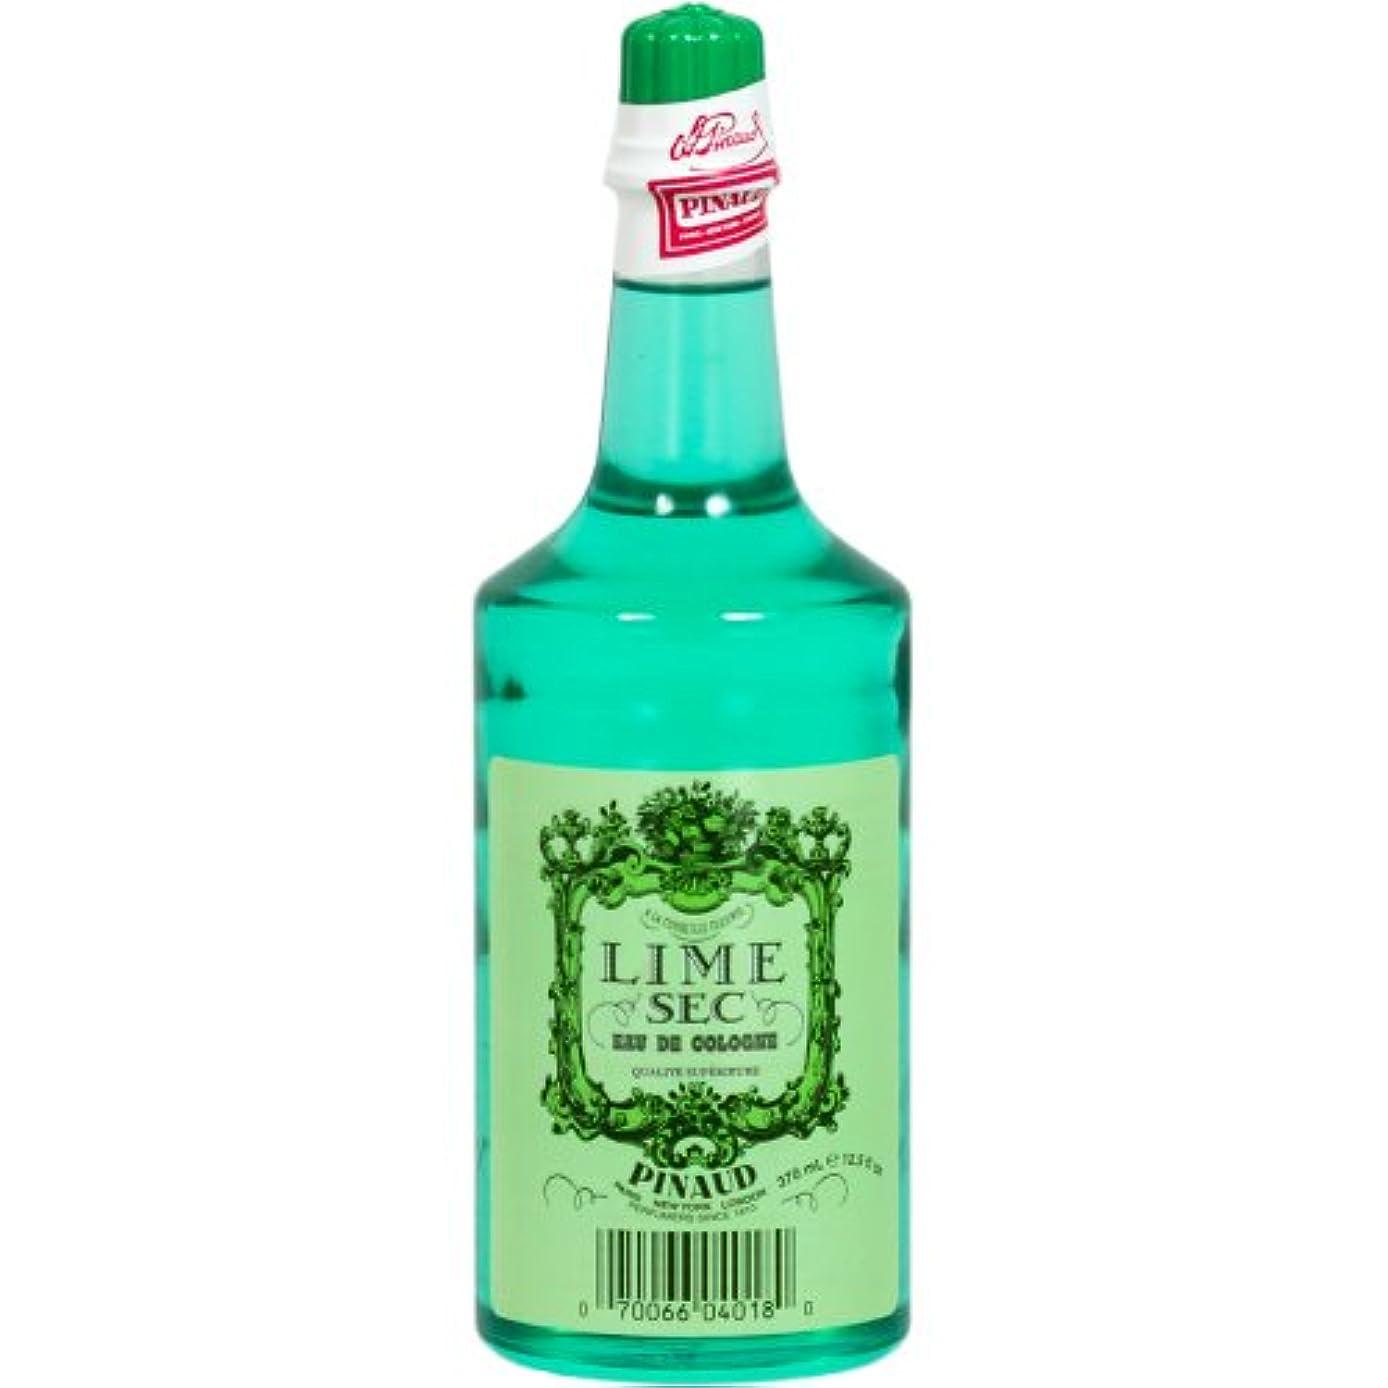 転送裏切り賄賂CLUBMAN Lime Sec Eau de Cologne, 12.5 oz (並行輸入品)